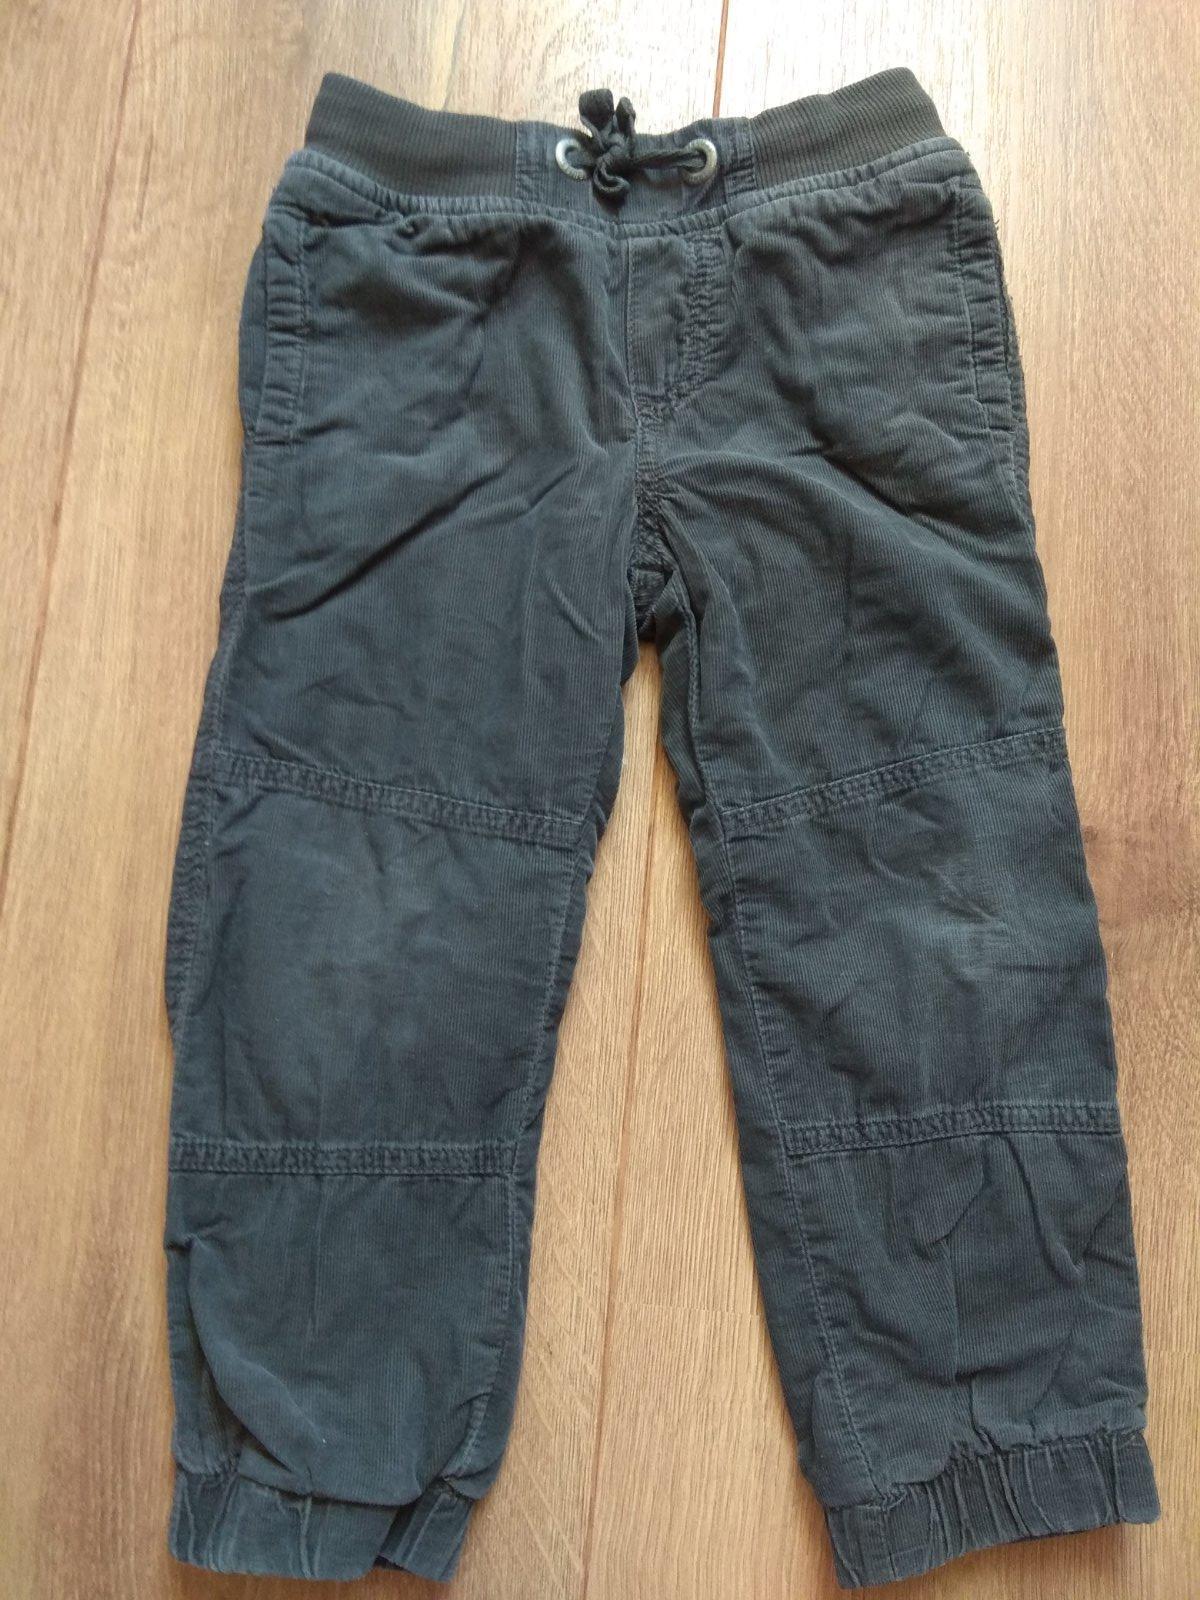 Zateplene mencestrove nohavice 92-98 - Obrázok č. 1